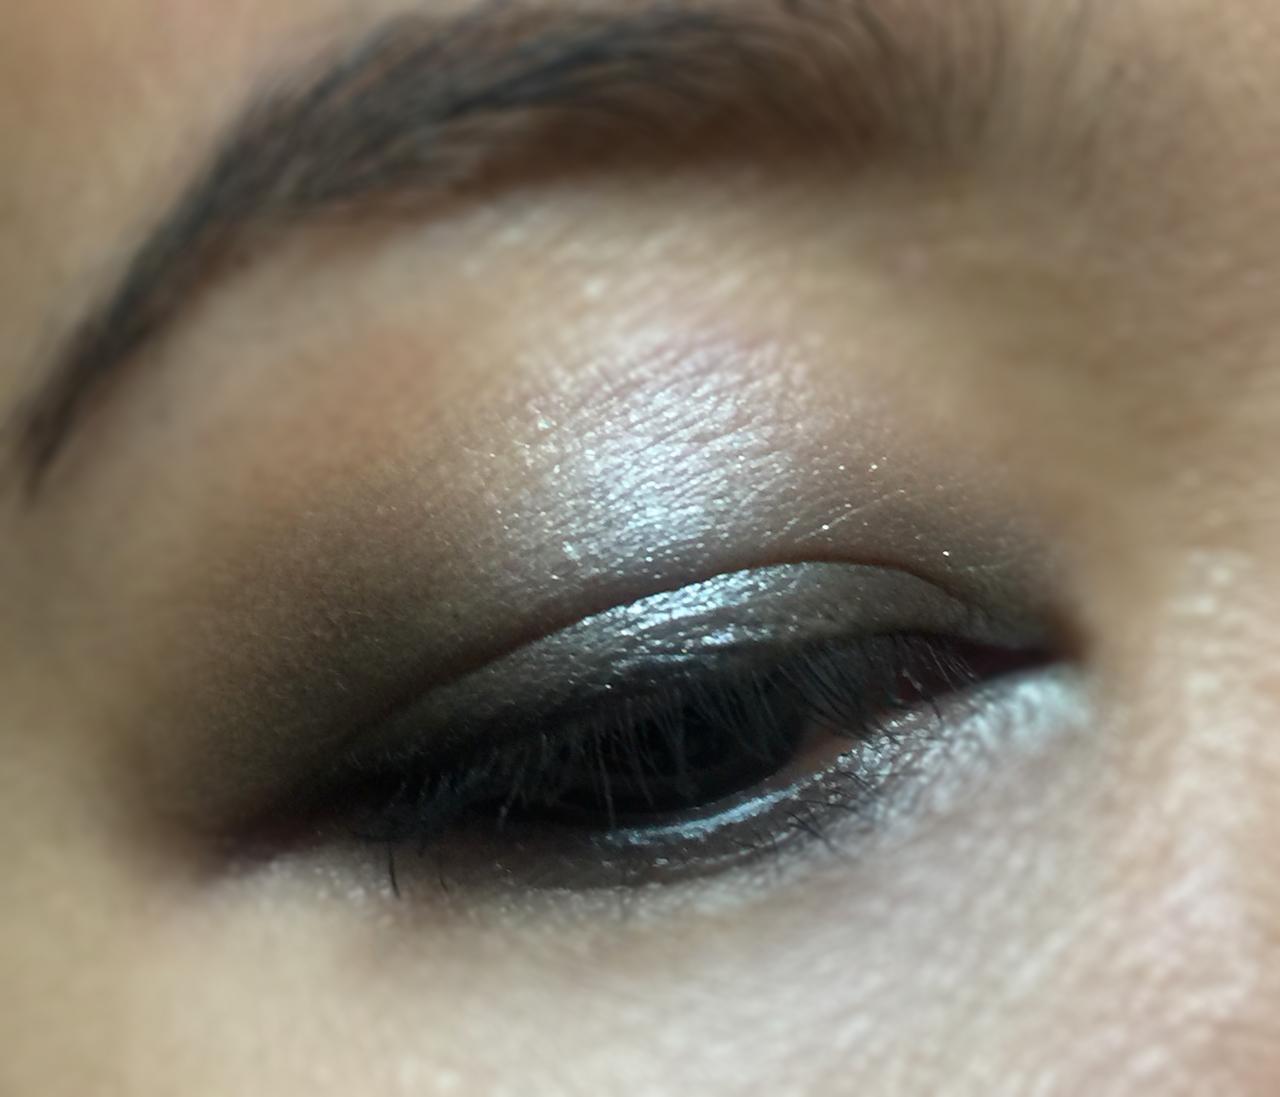 chanel-architectonic-eyeshadow-palette-eotd-2